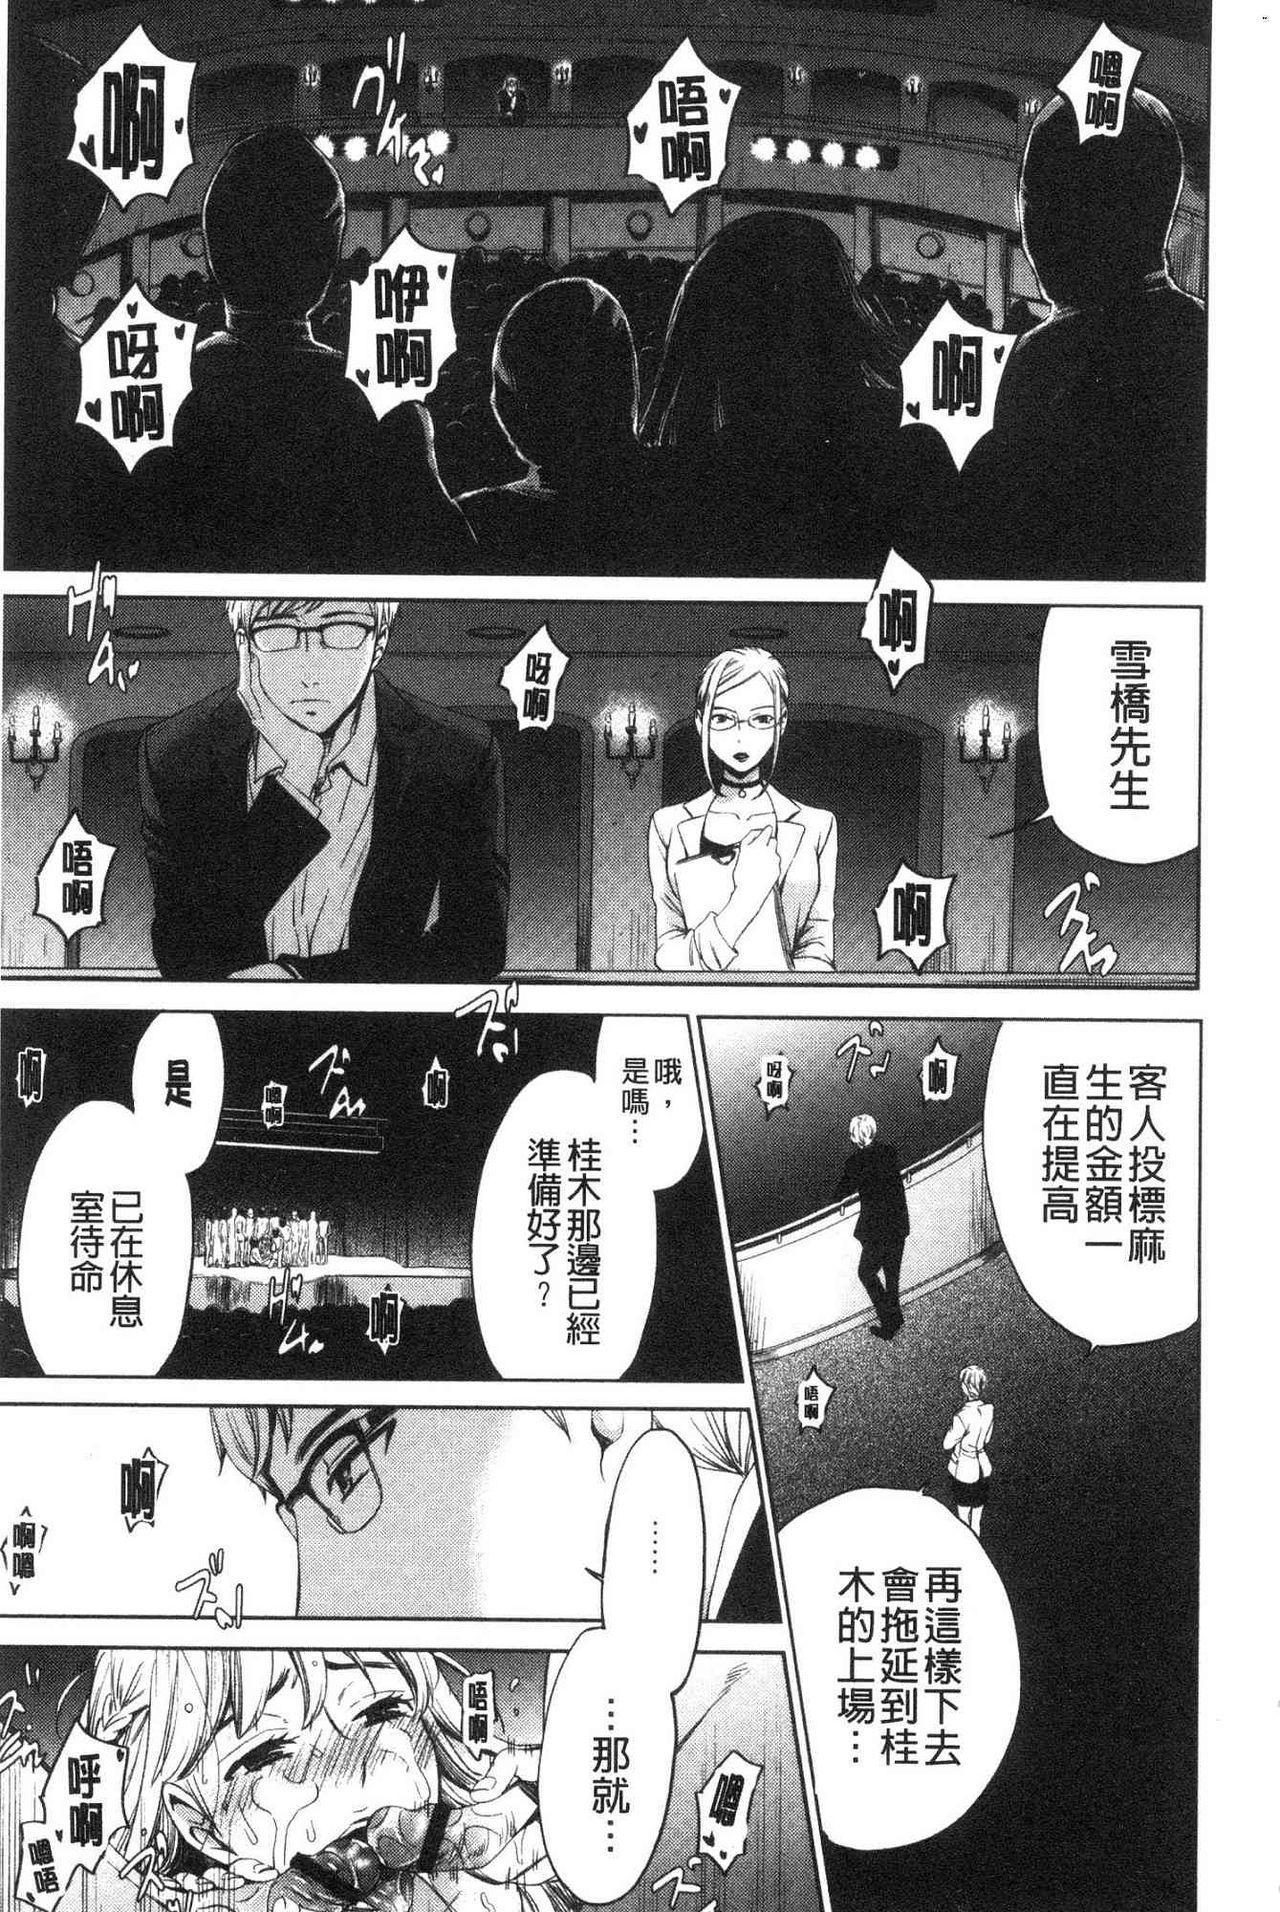 [Gotoh Akira]  21-ji no Onna ~Camera no Mae no Mesuinu~ 2 | 21時之女 ~鏡頭前的牝犬~ 2 [Chinese] 188